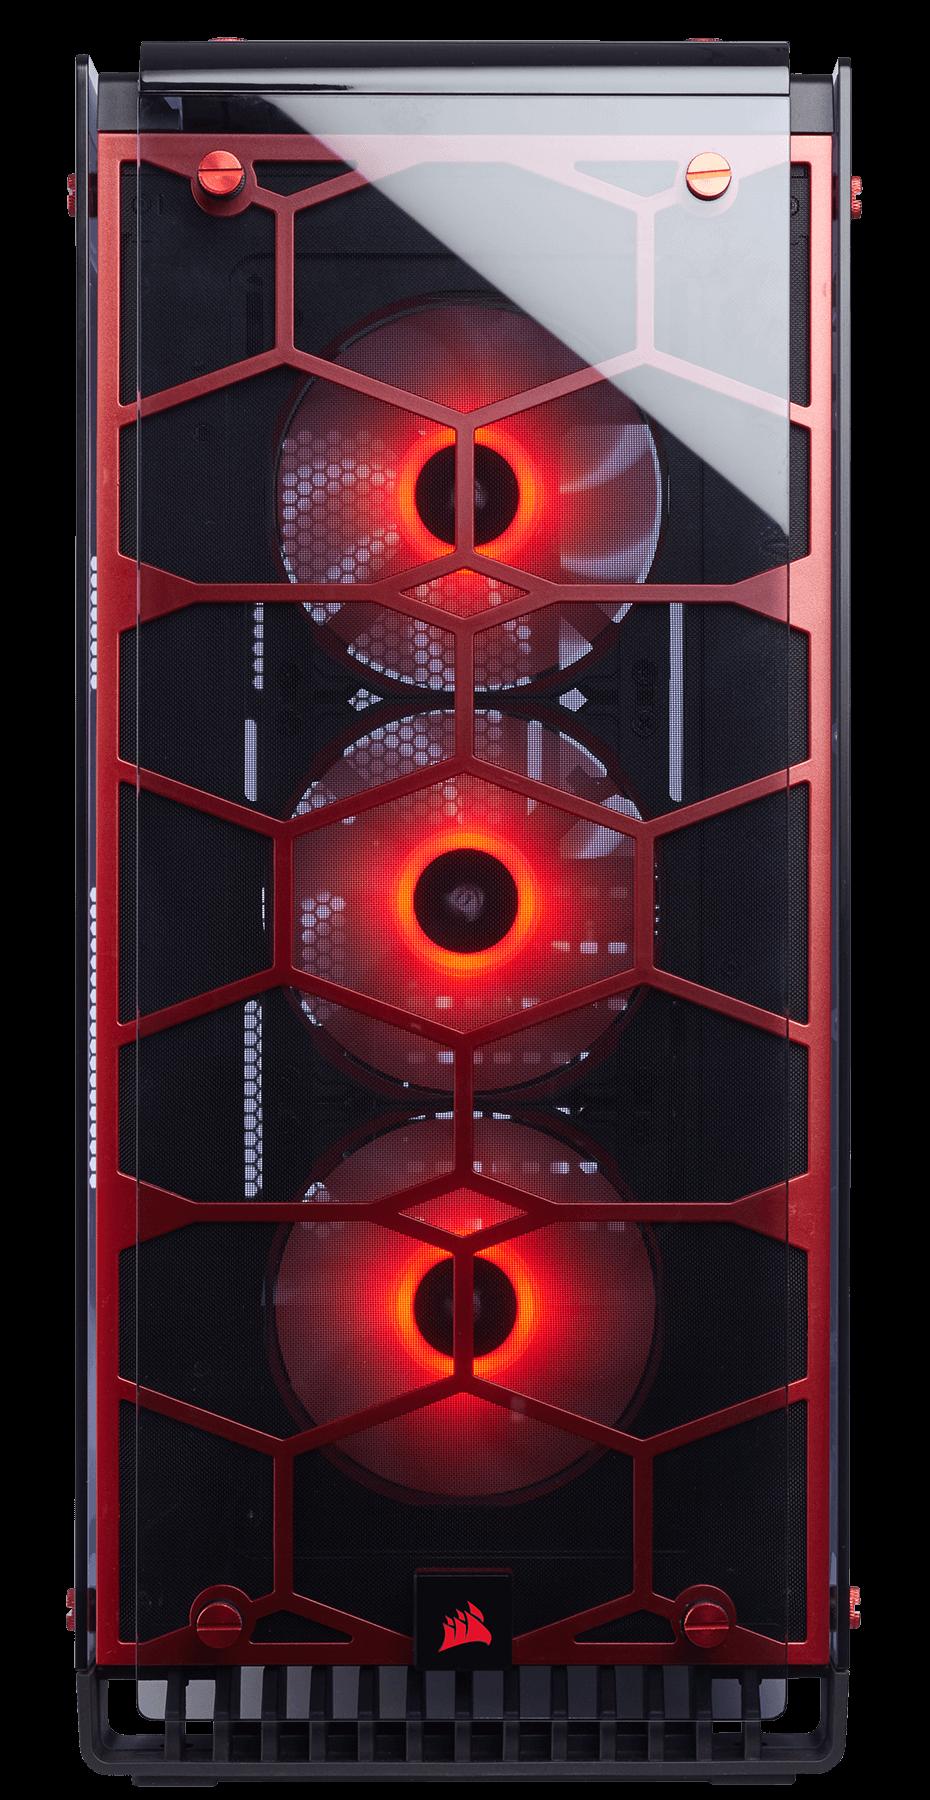 Carcasa P Corsair Crystal Series 570X RGB Tempered Glass Red